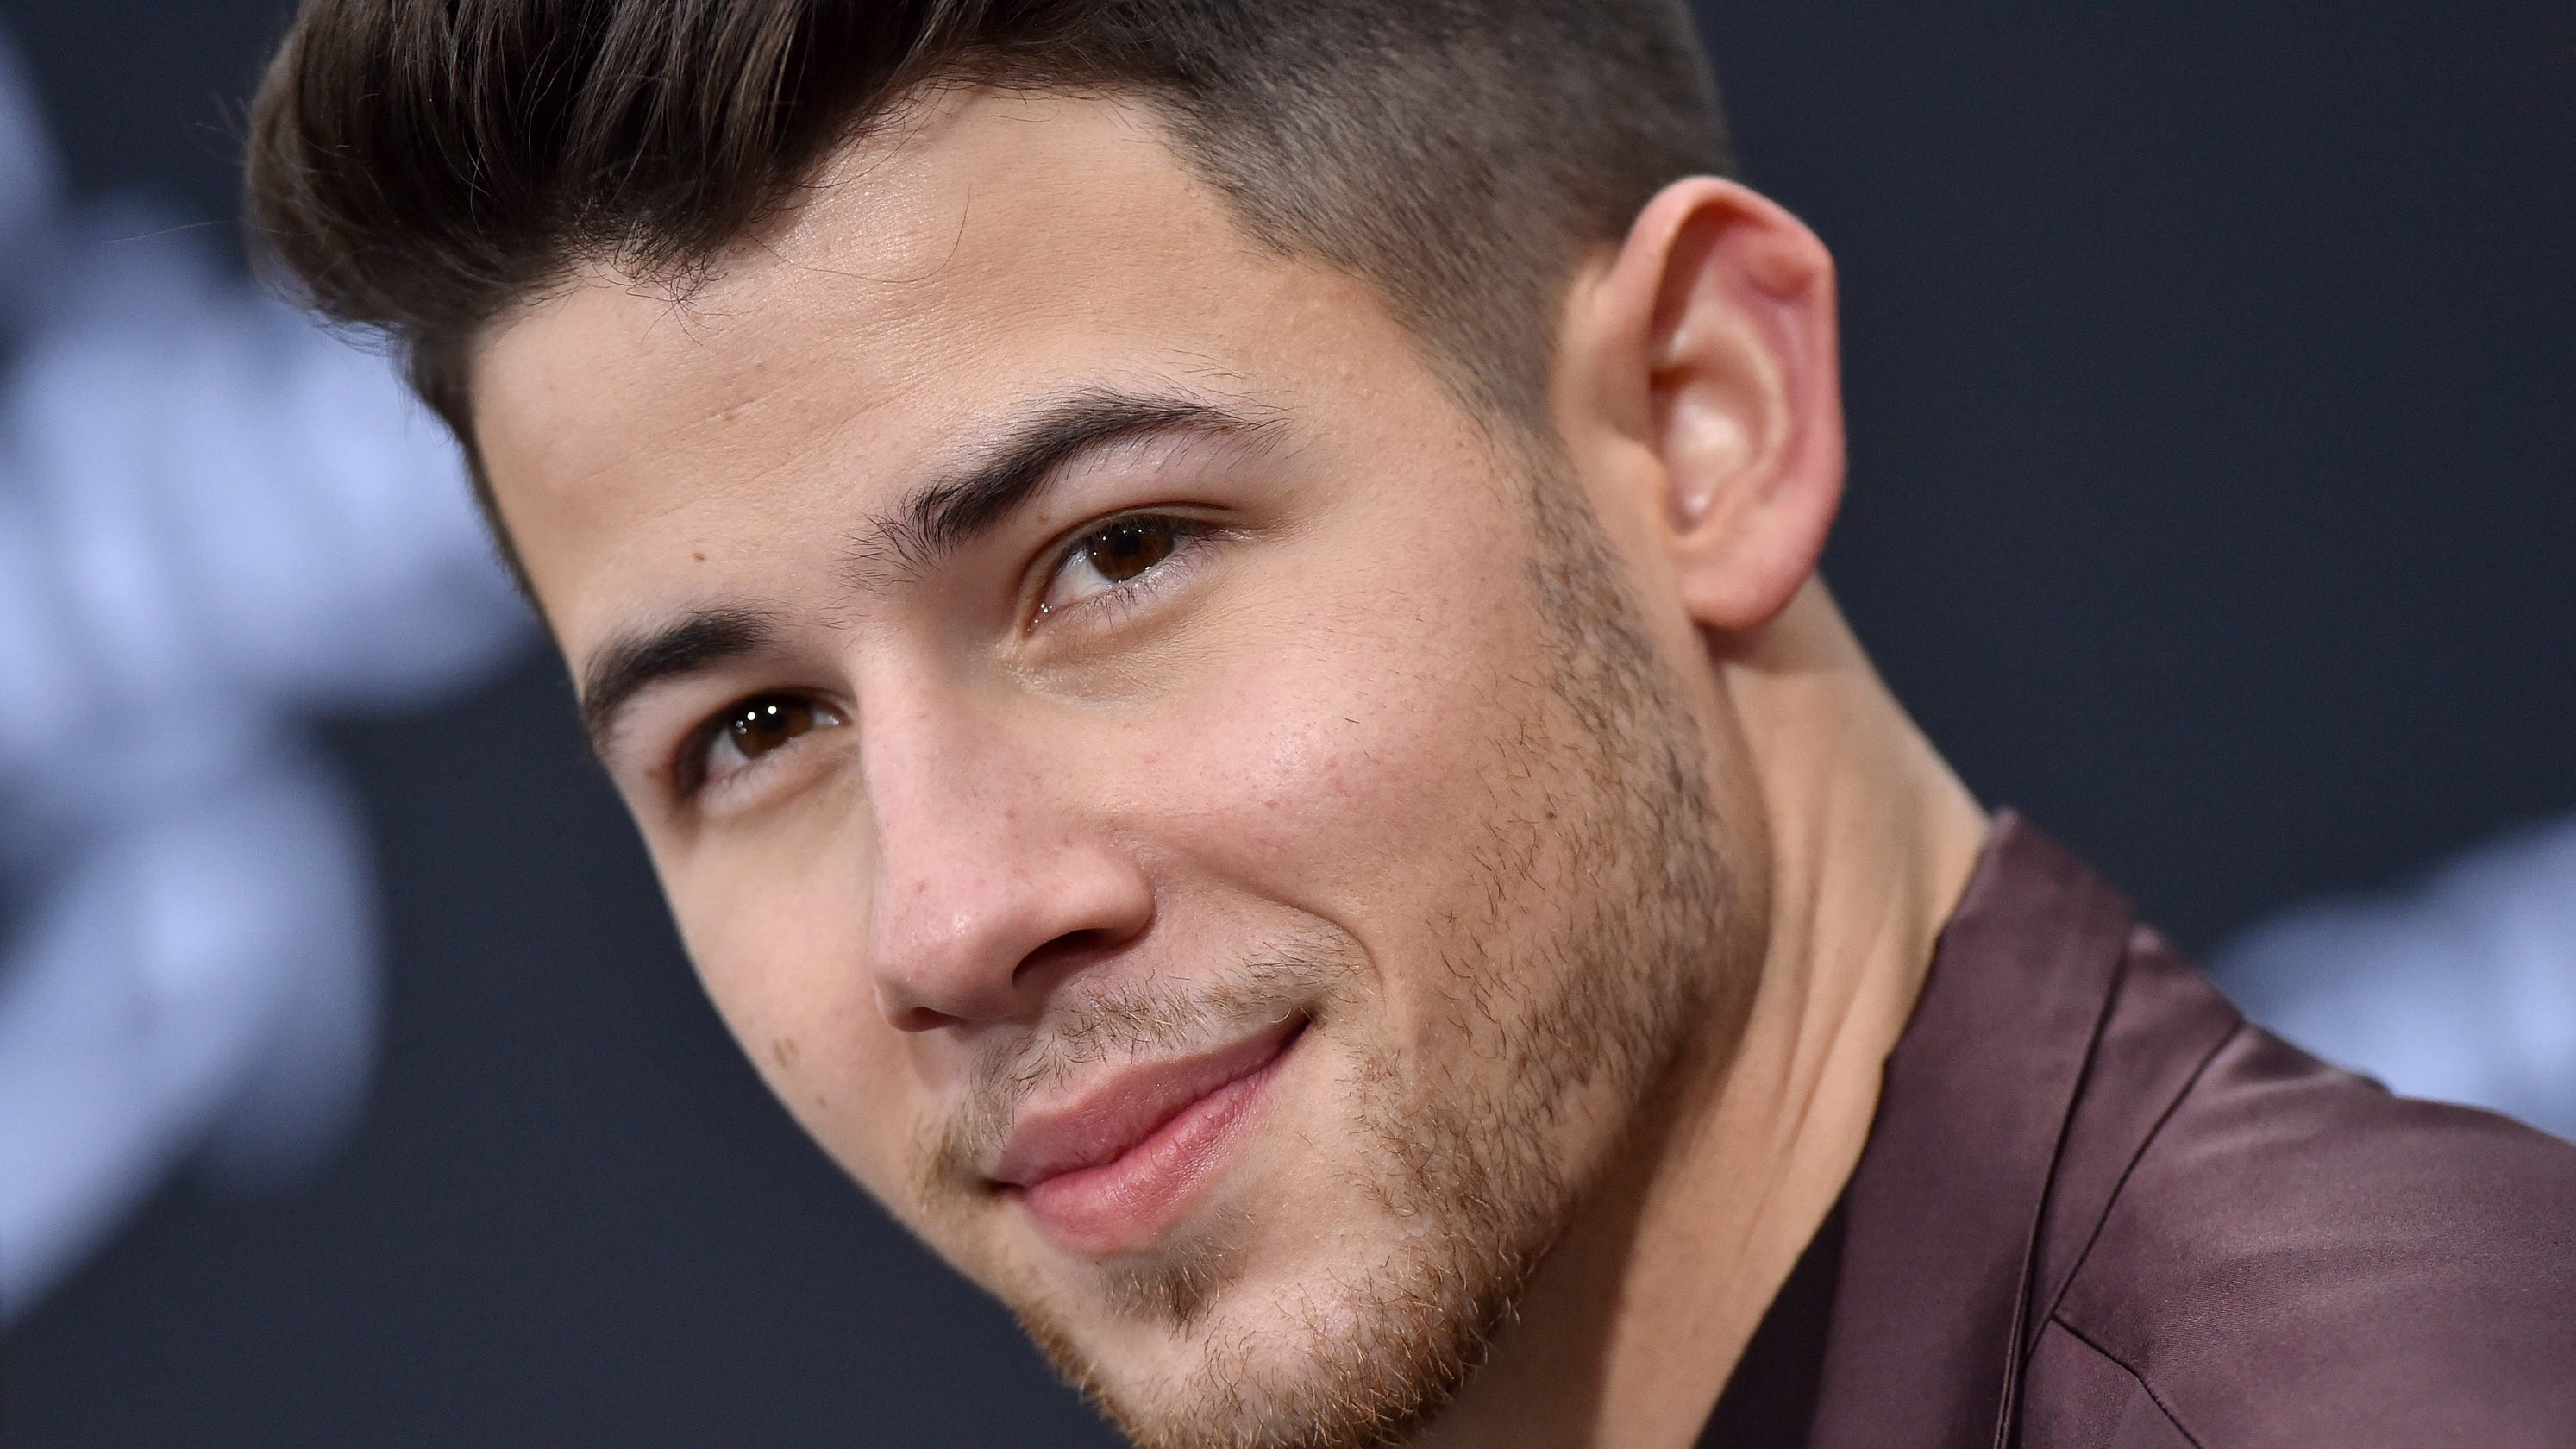 Nick Jonas Faces Backlash For Promoting Smoking On Magazine Cover